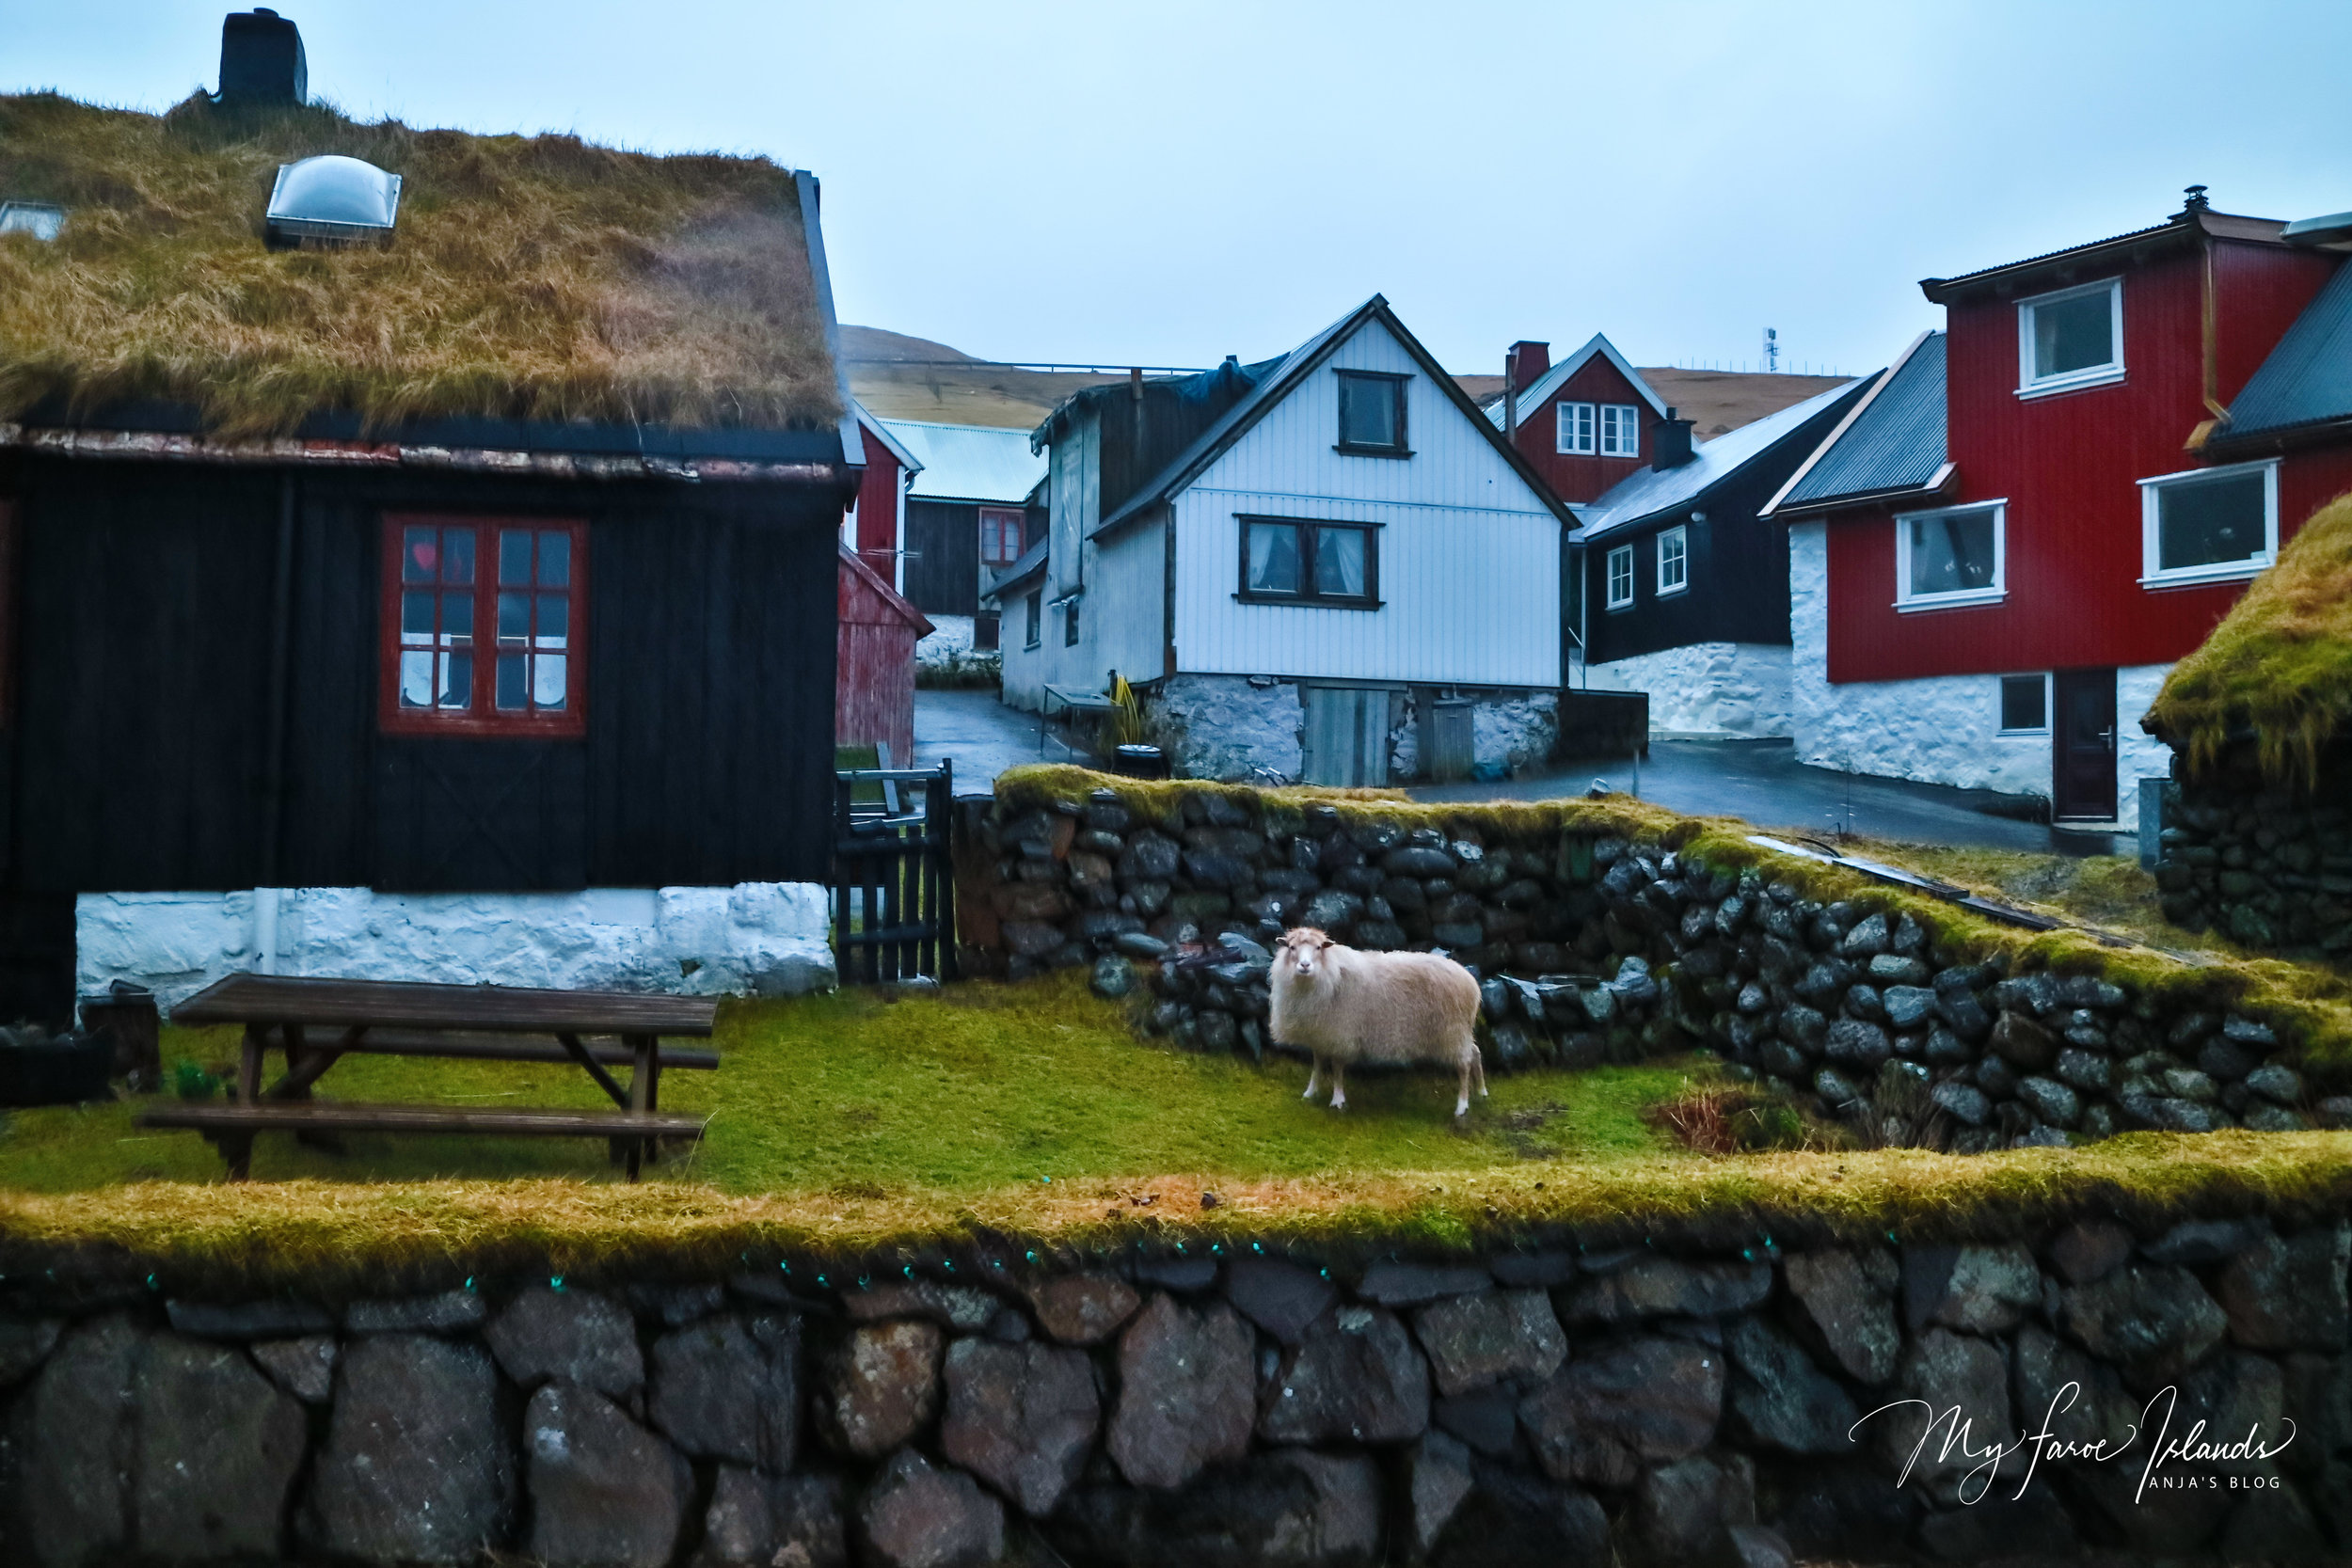 Sheep Near Picnic Table © My Faroe Islands, Anja Mazuhn  (1 von 1).jpg